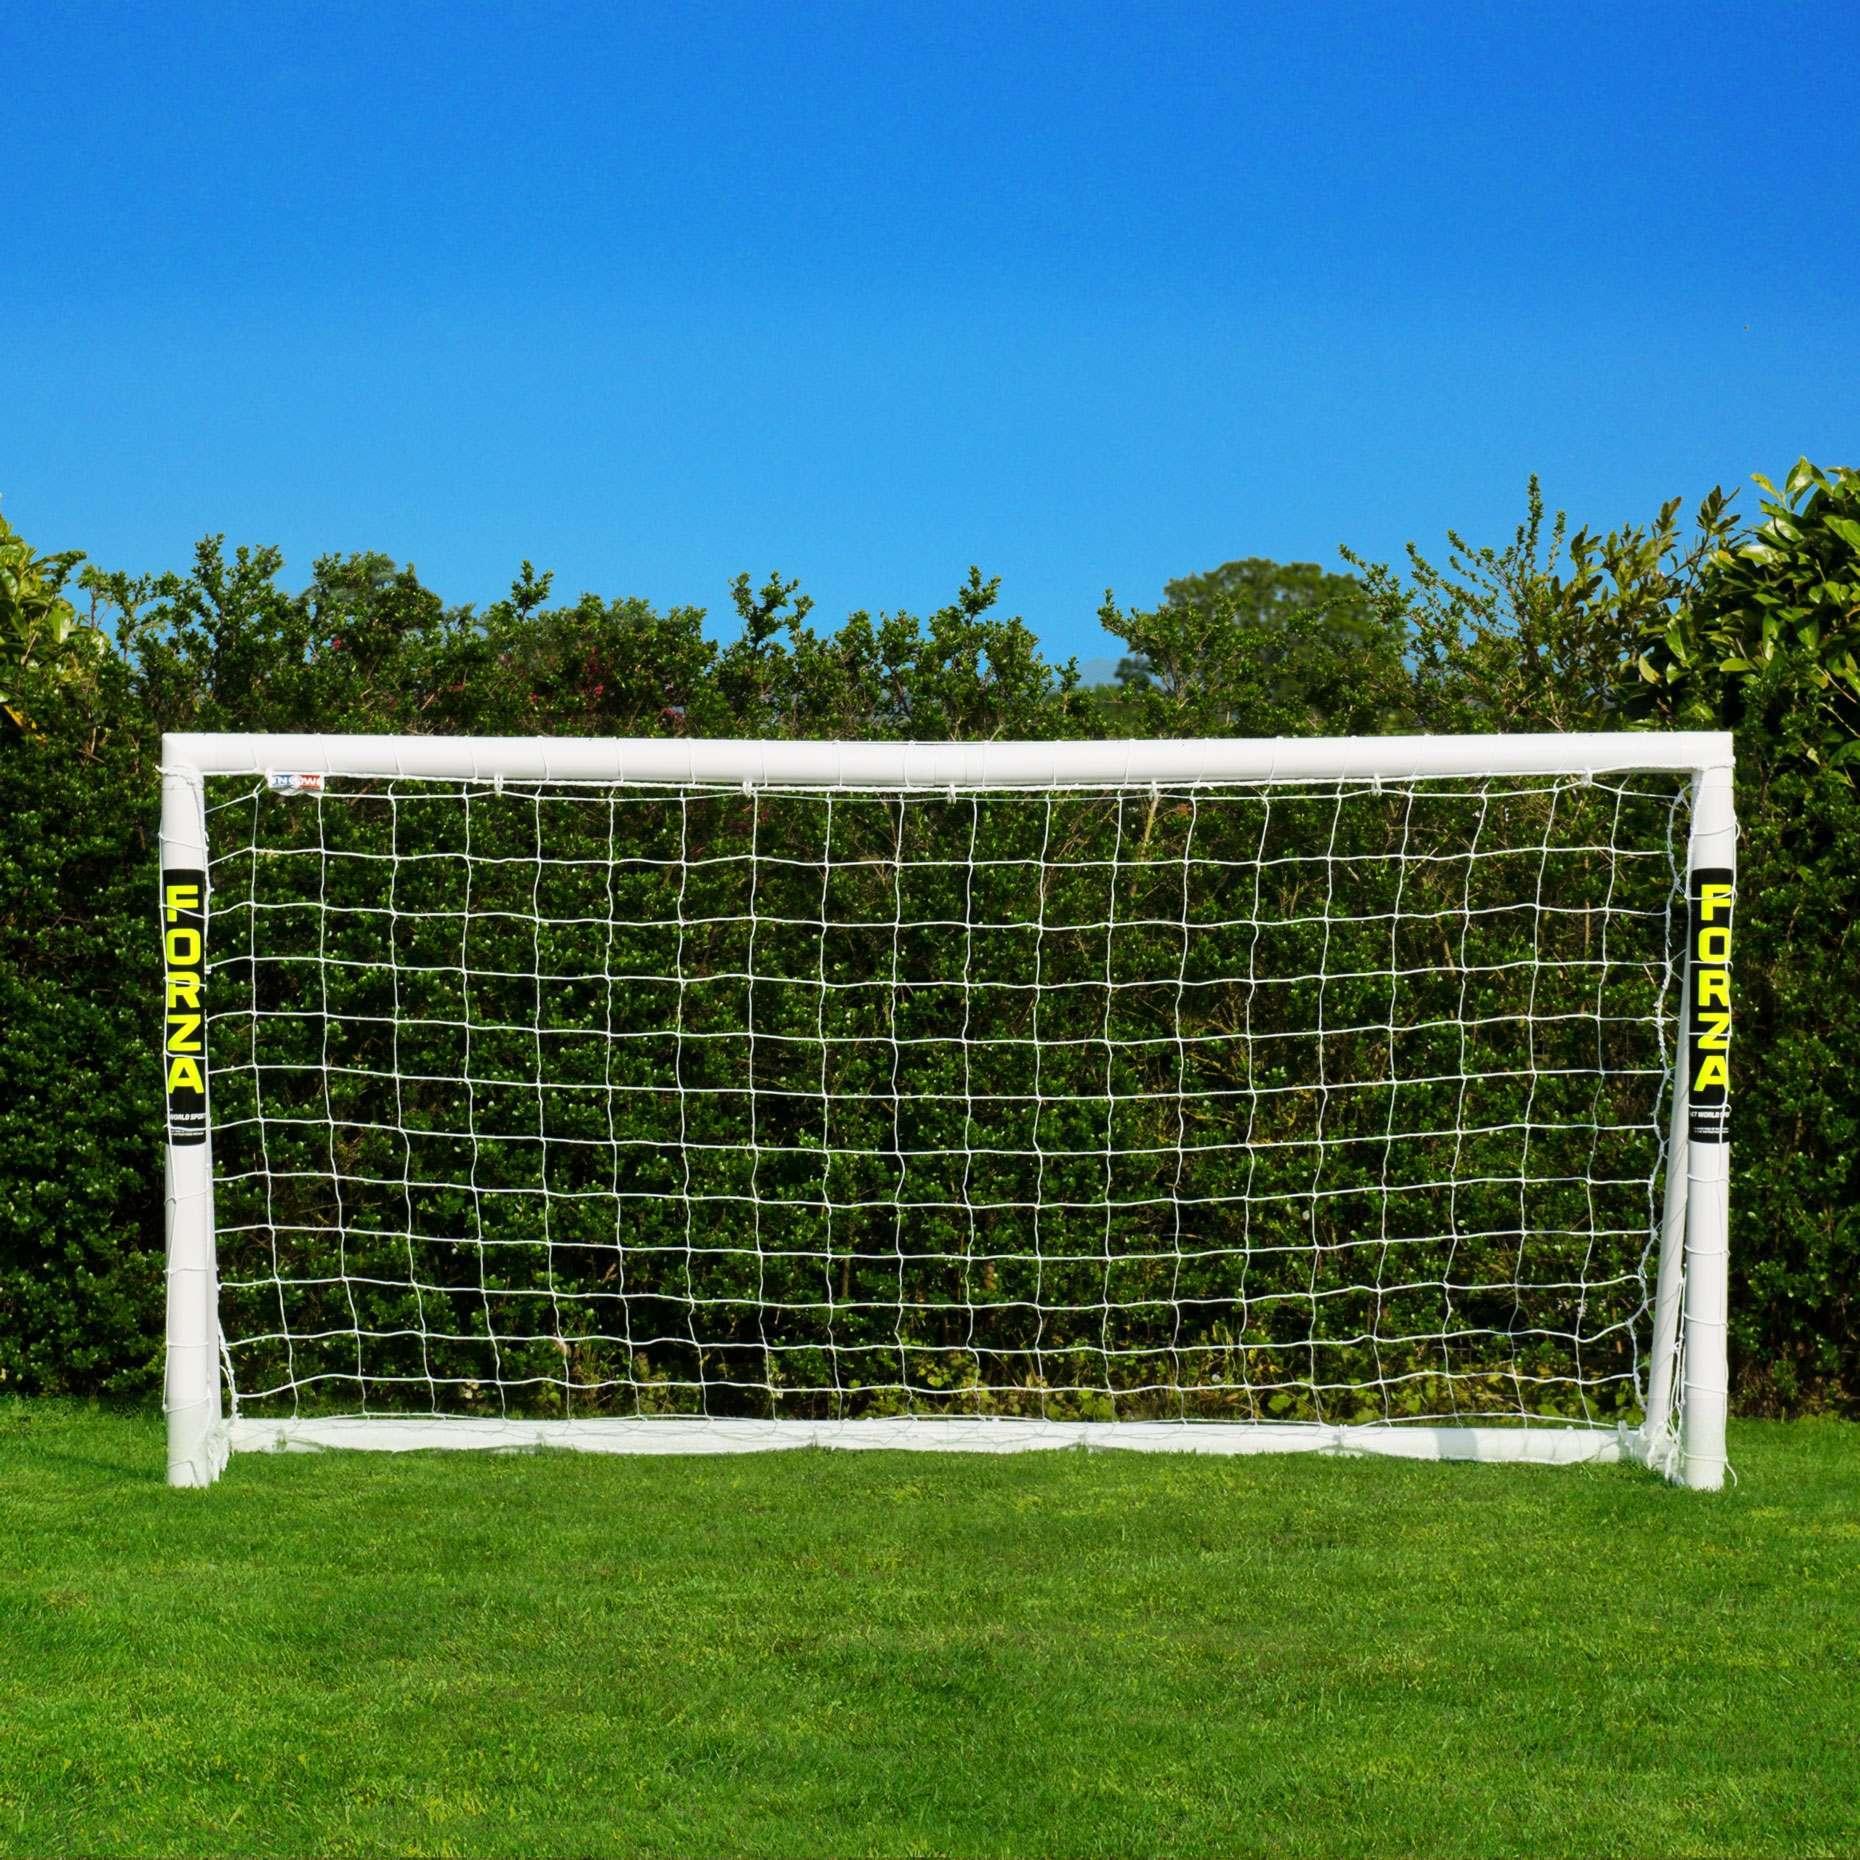 10ee0a31b 8 x 4 FORZA PVC Soccer Goal Post | FORZA Goal